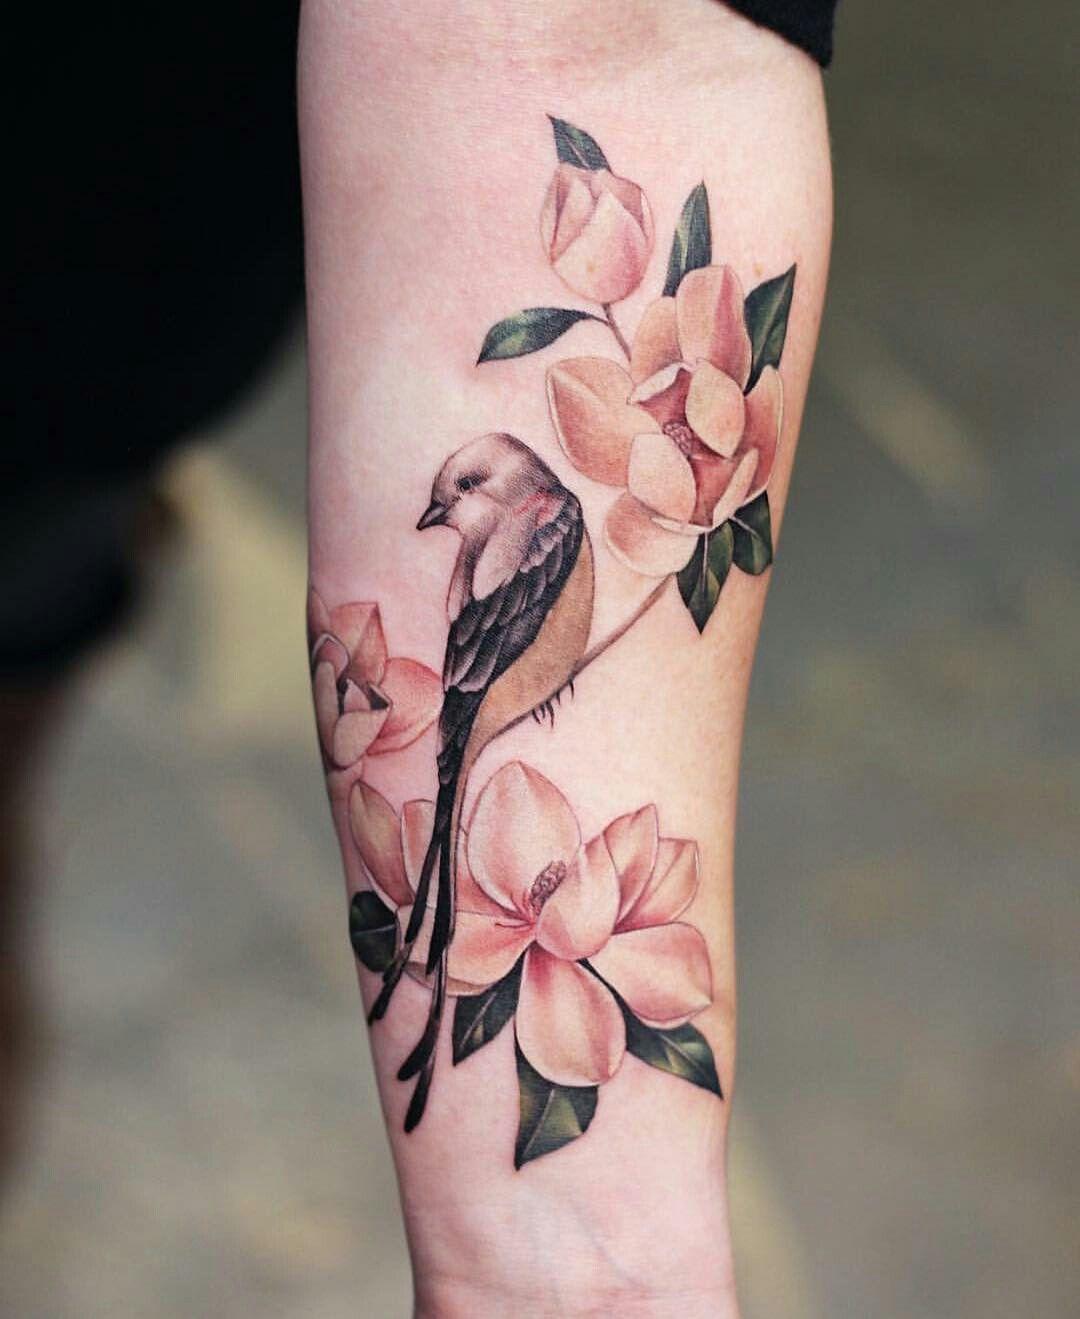 Floral Bird Tattoo Floral Tattoo Sleeve Bird Tattoo Sleeves Vine Tattoos